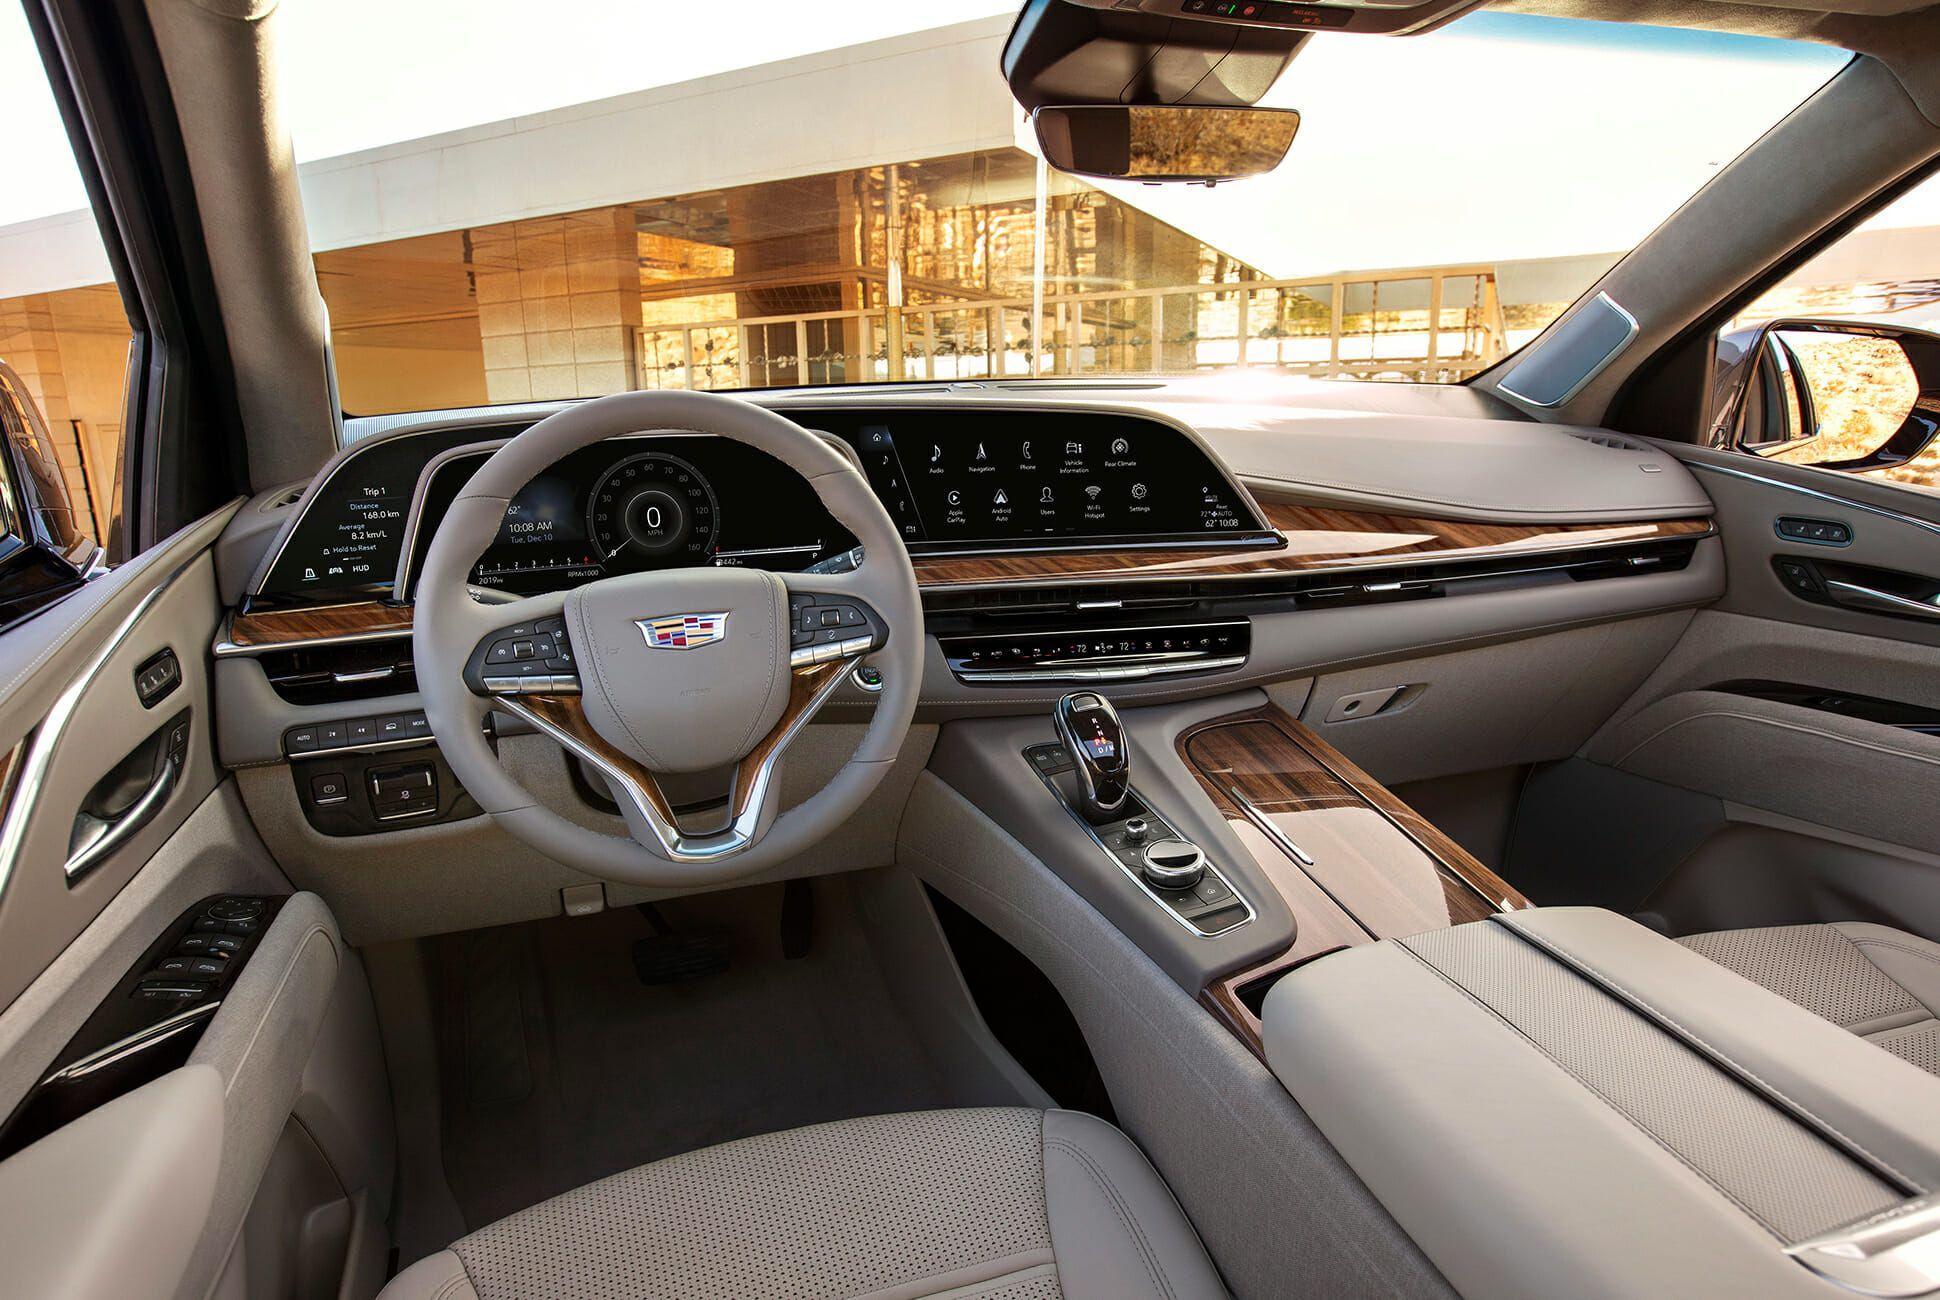 The New 2021 Cadillac Escalade Has Arrived • Gear Patrol